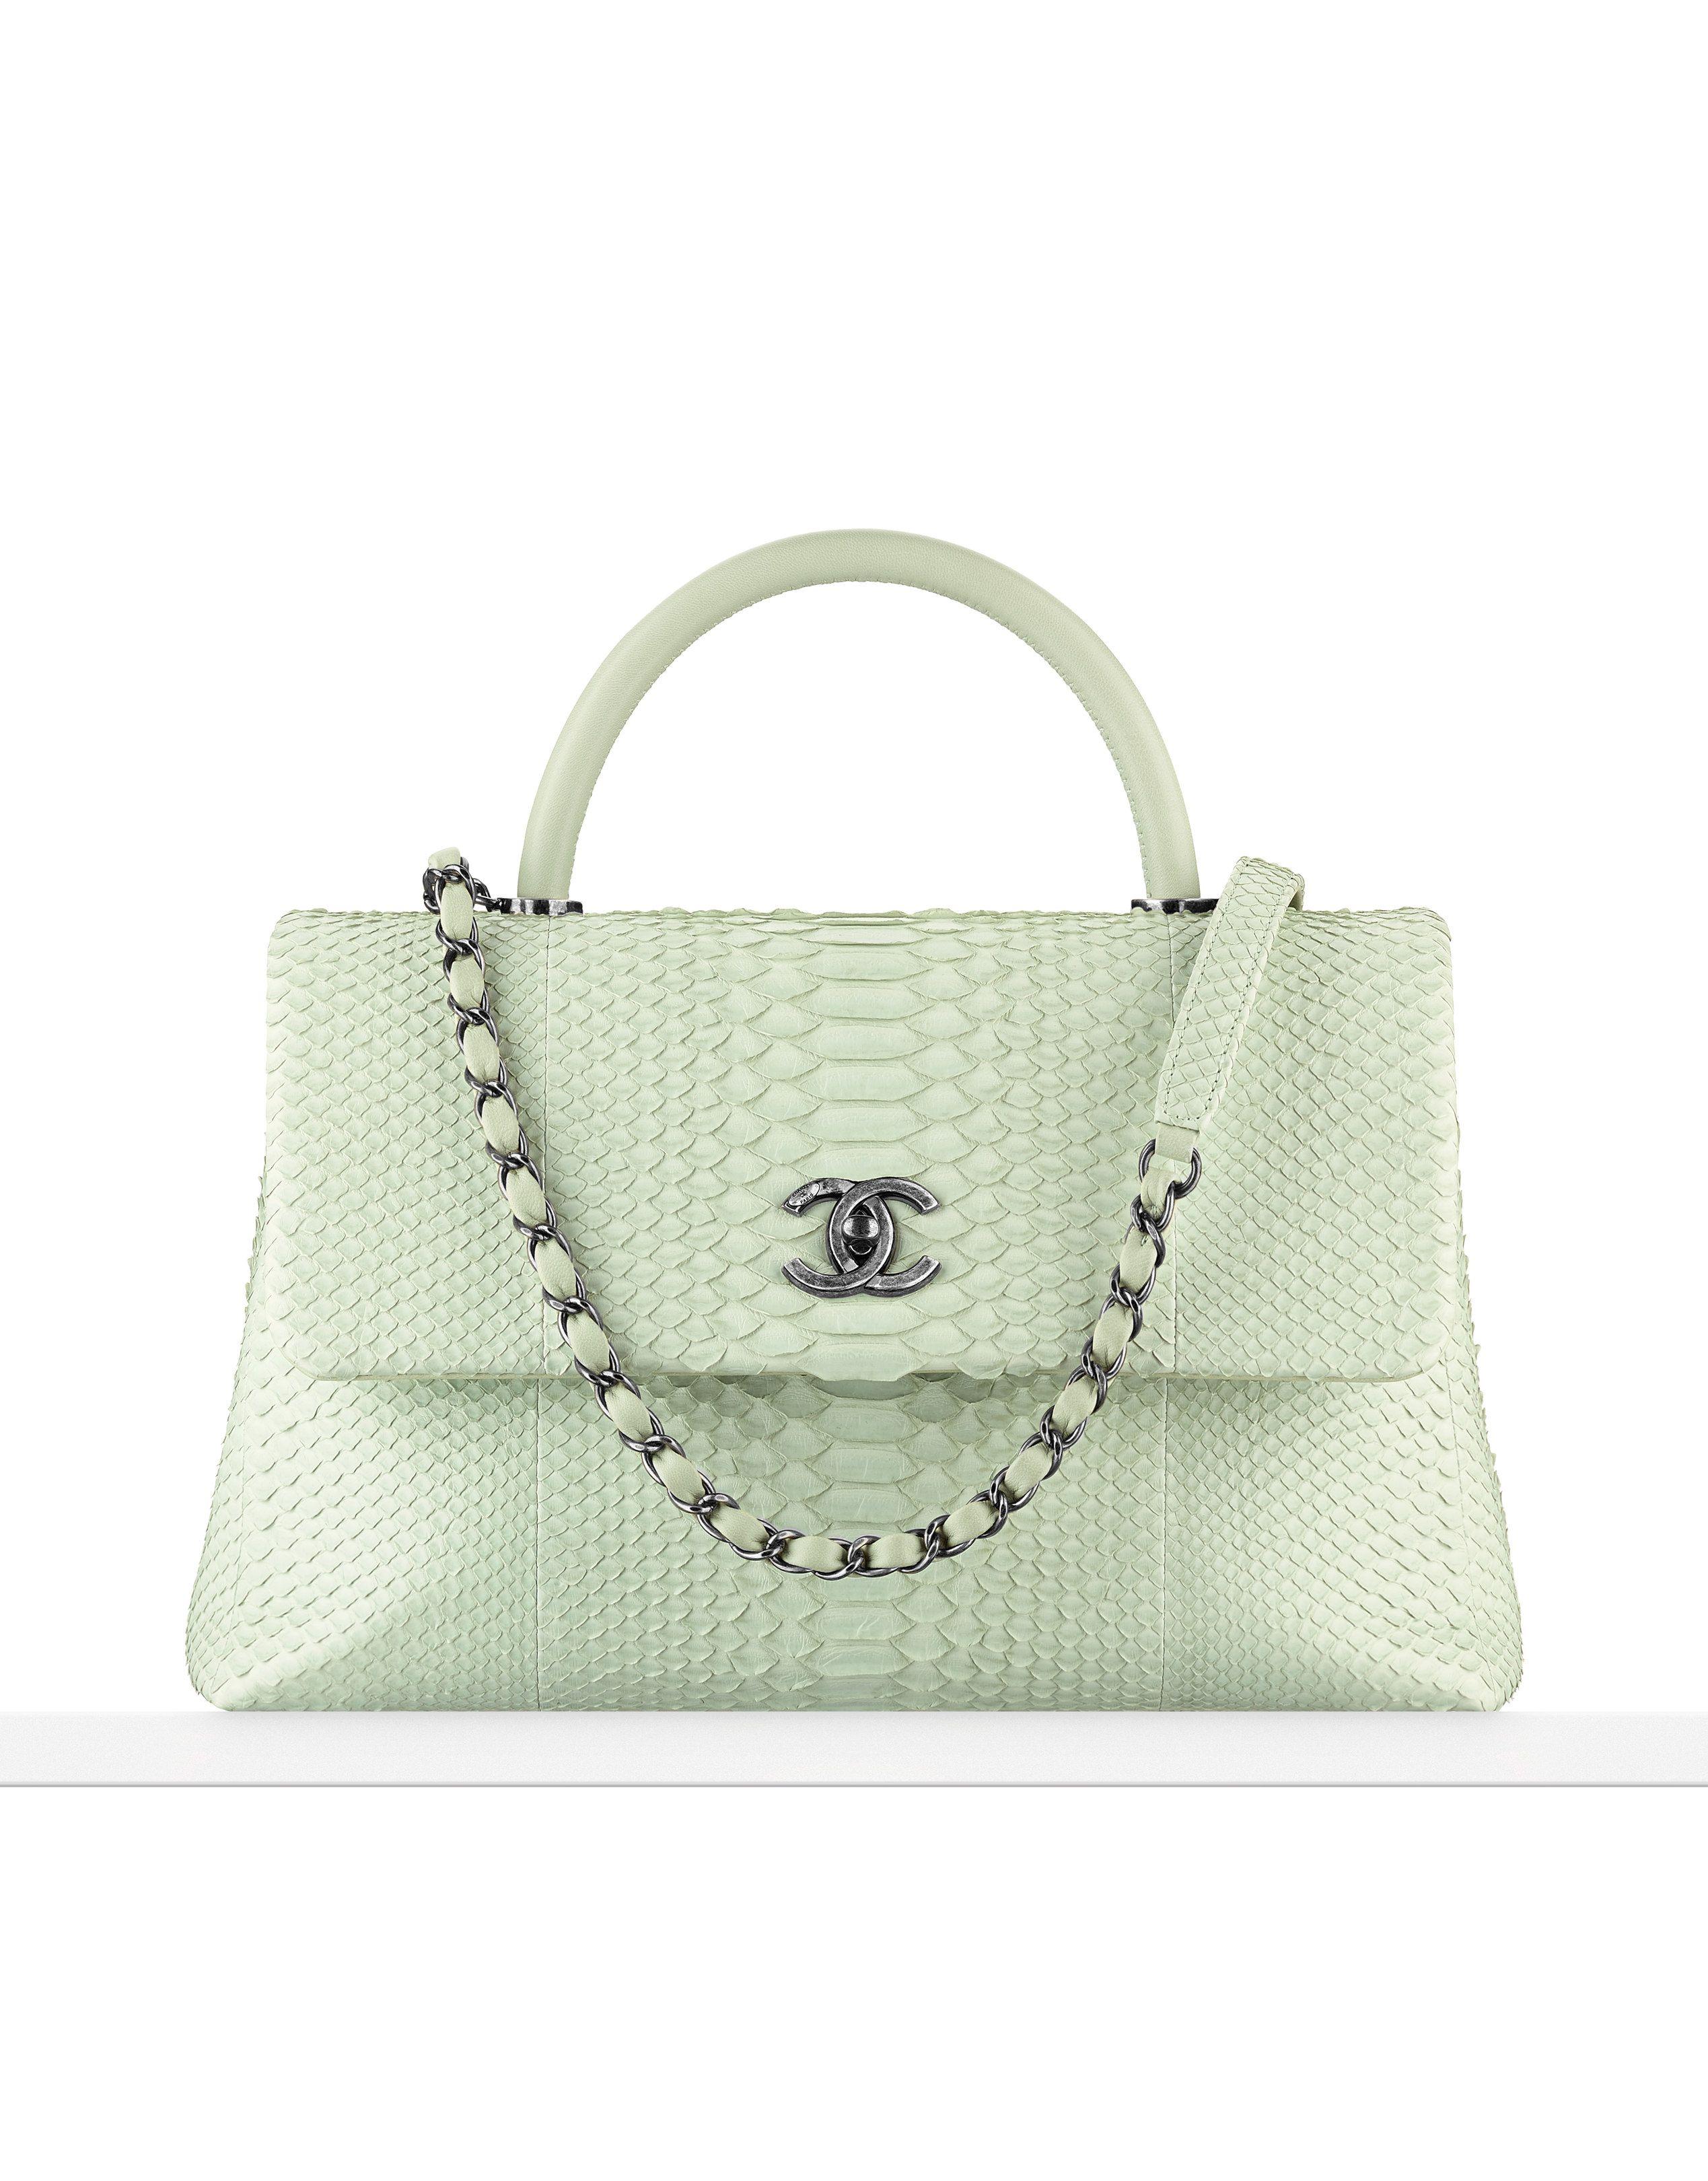 86270b74f3a1 Flap bag with handle, python & lambskin-light green - CHANEL ...